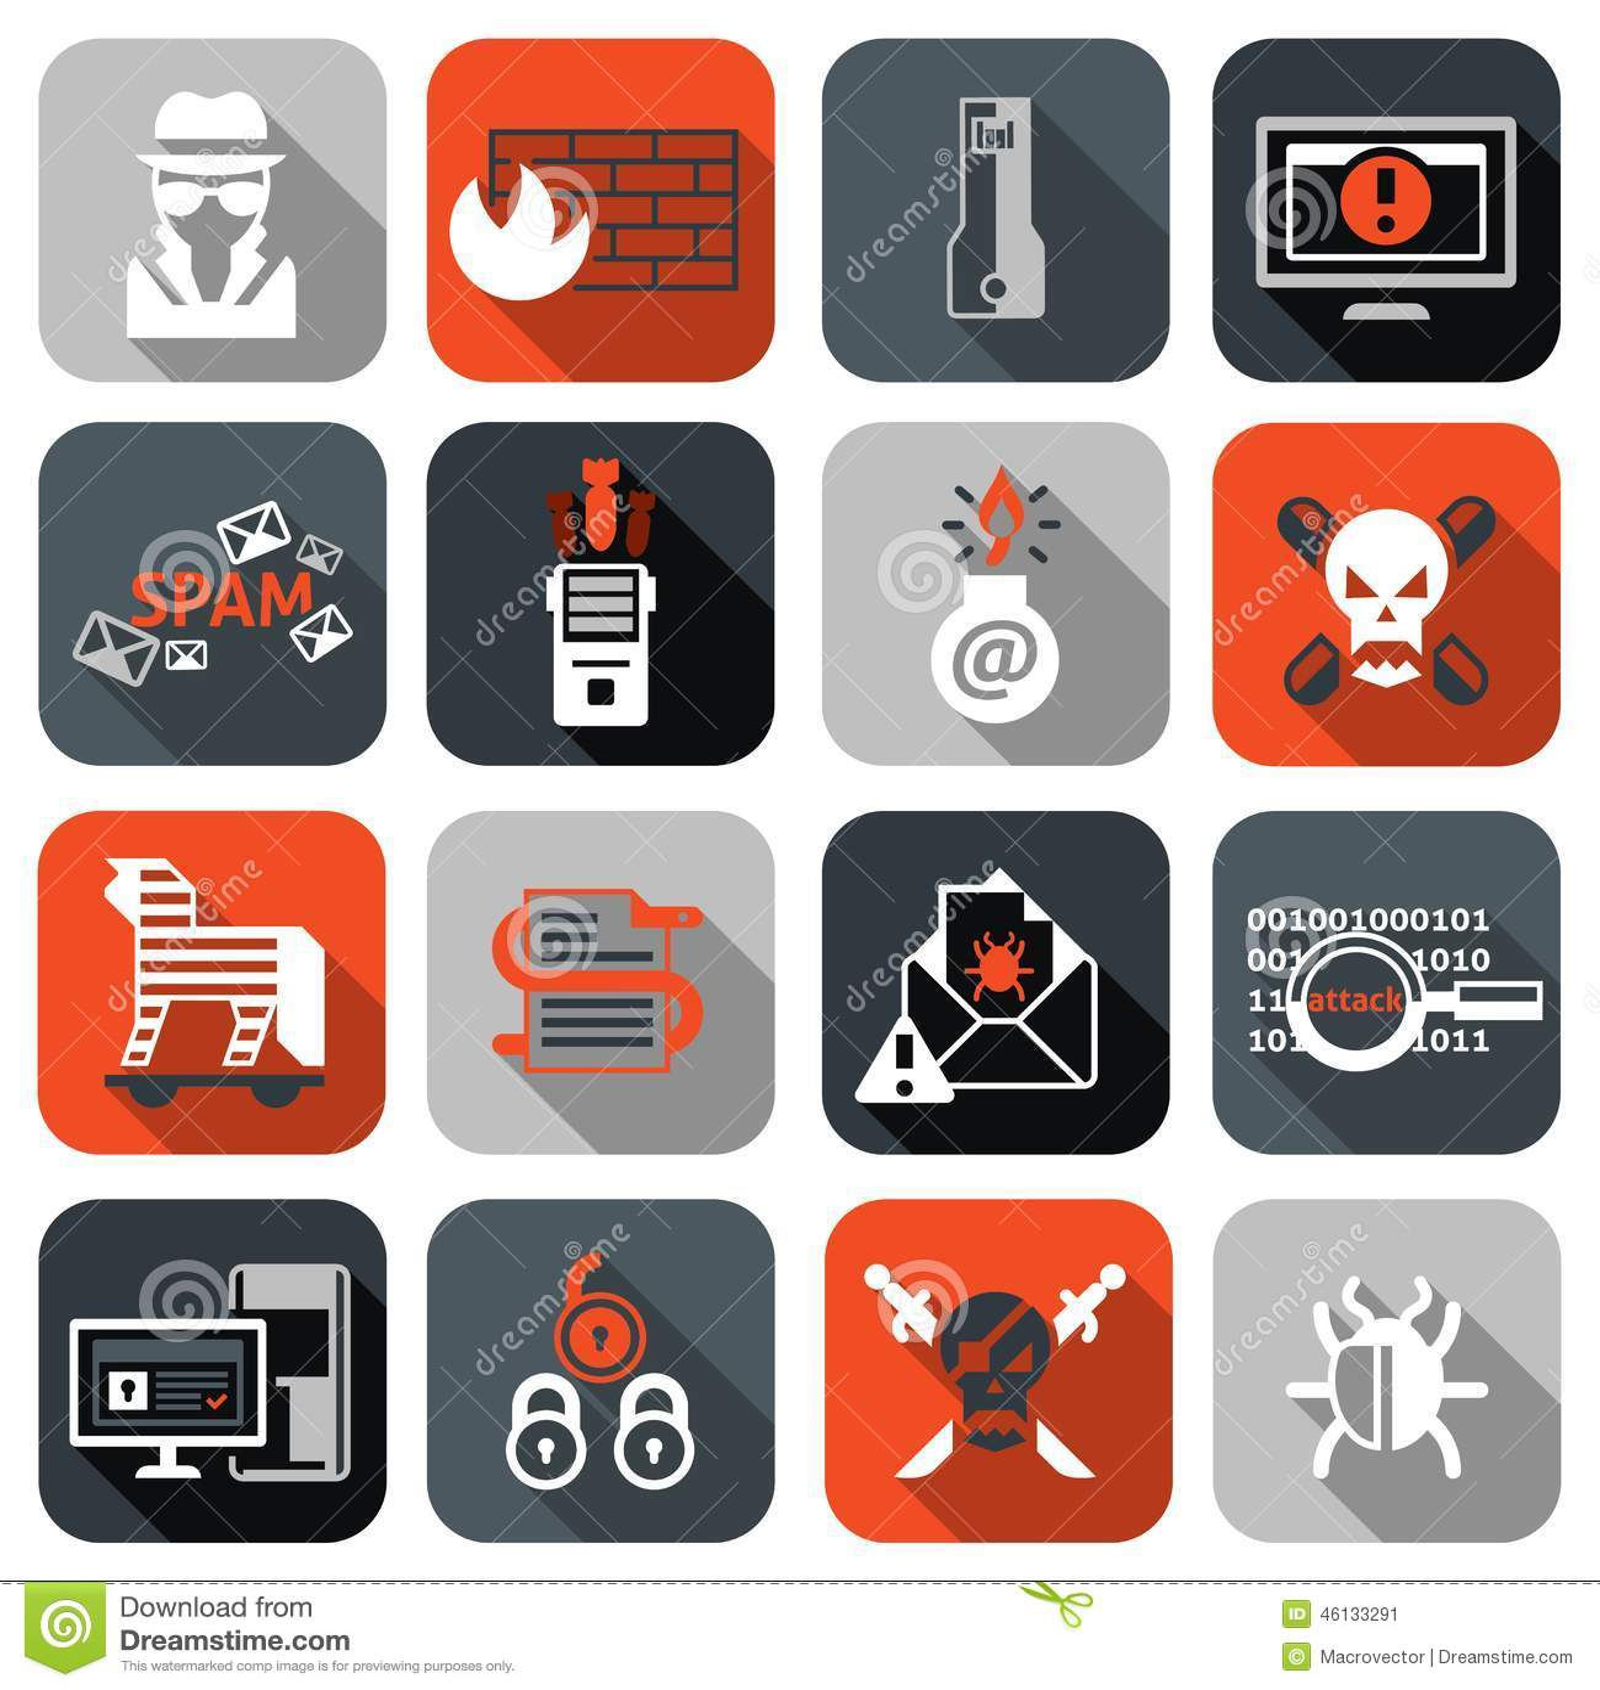 Hacker Icons Set Flat Stock Vector - Image: 46133291